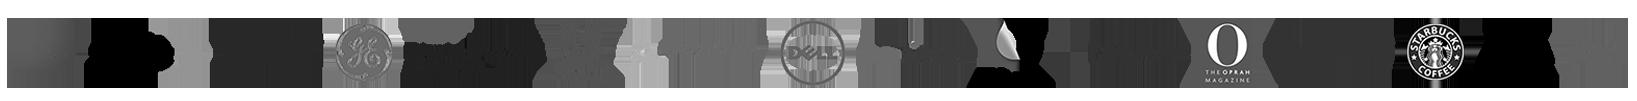 client-logos-2017.png